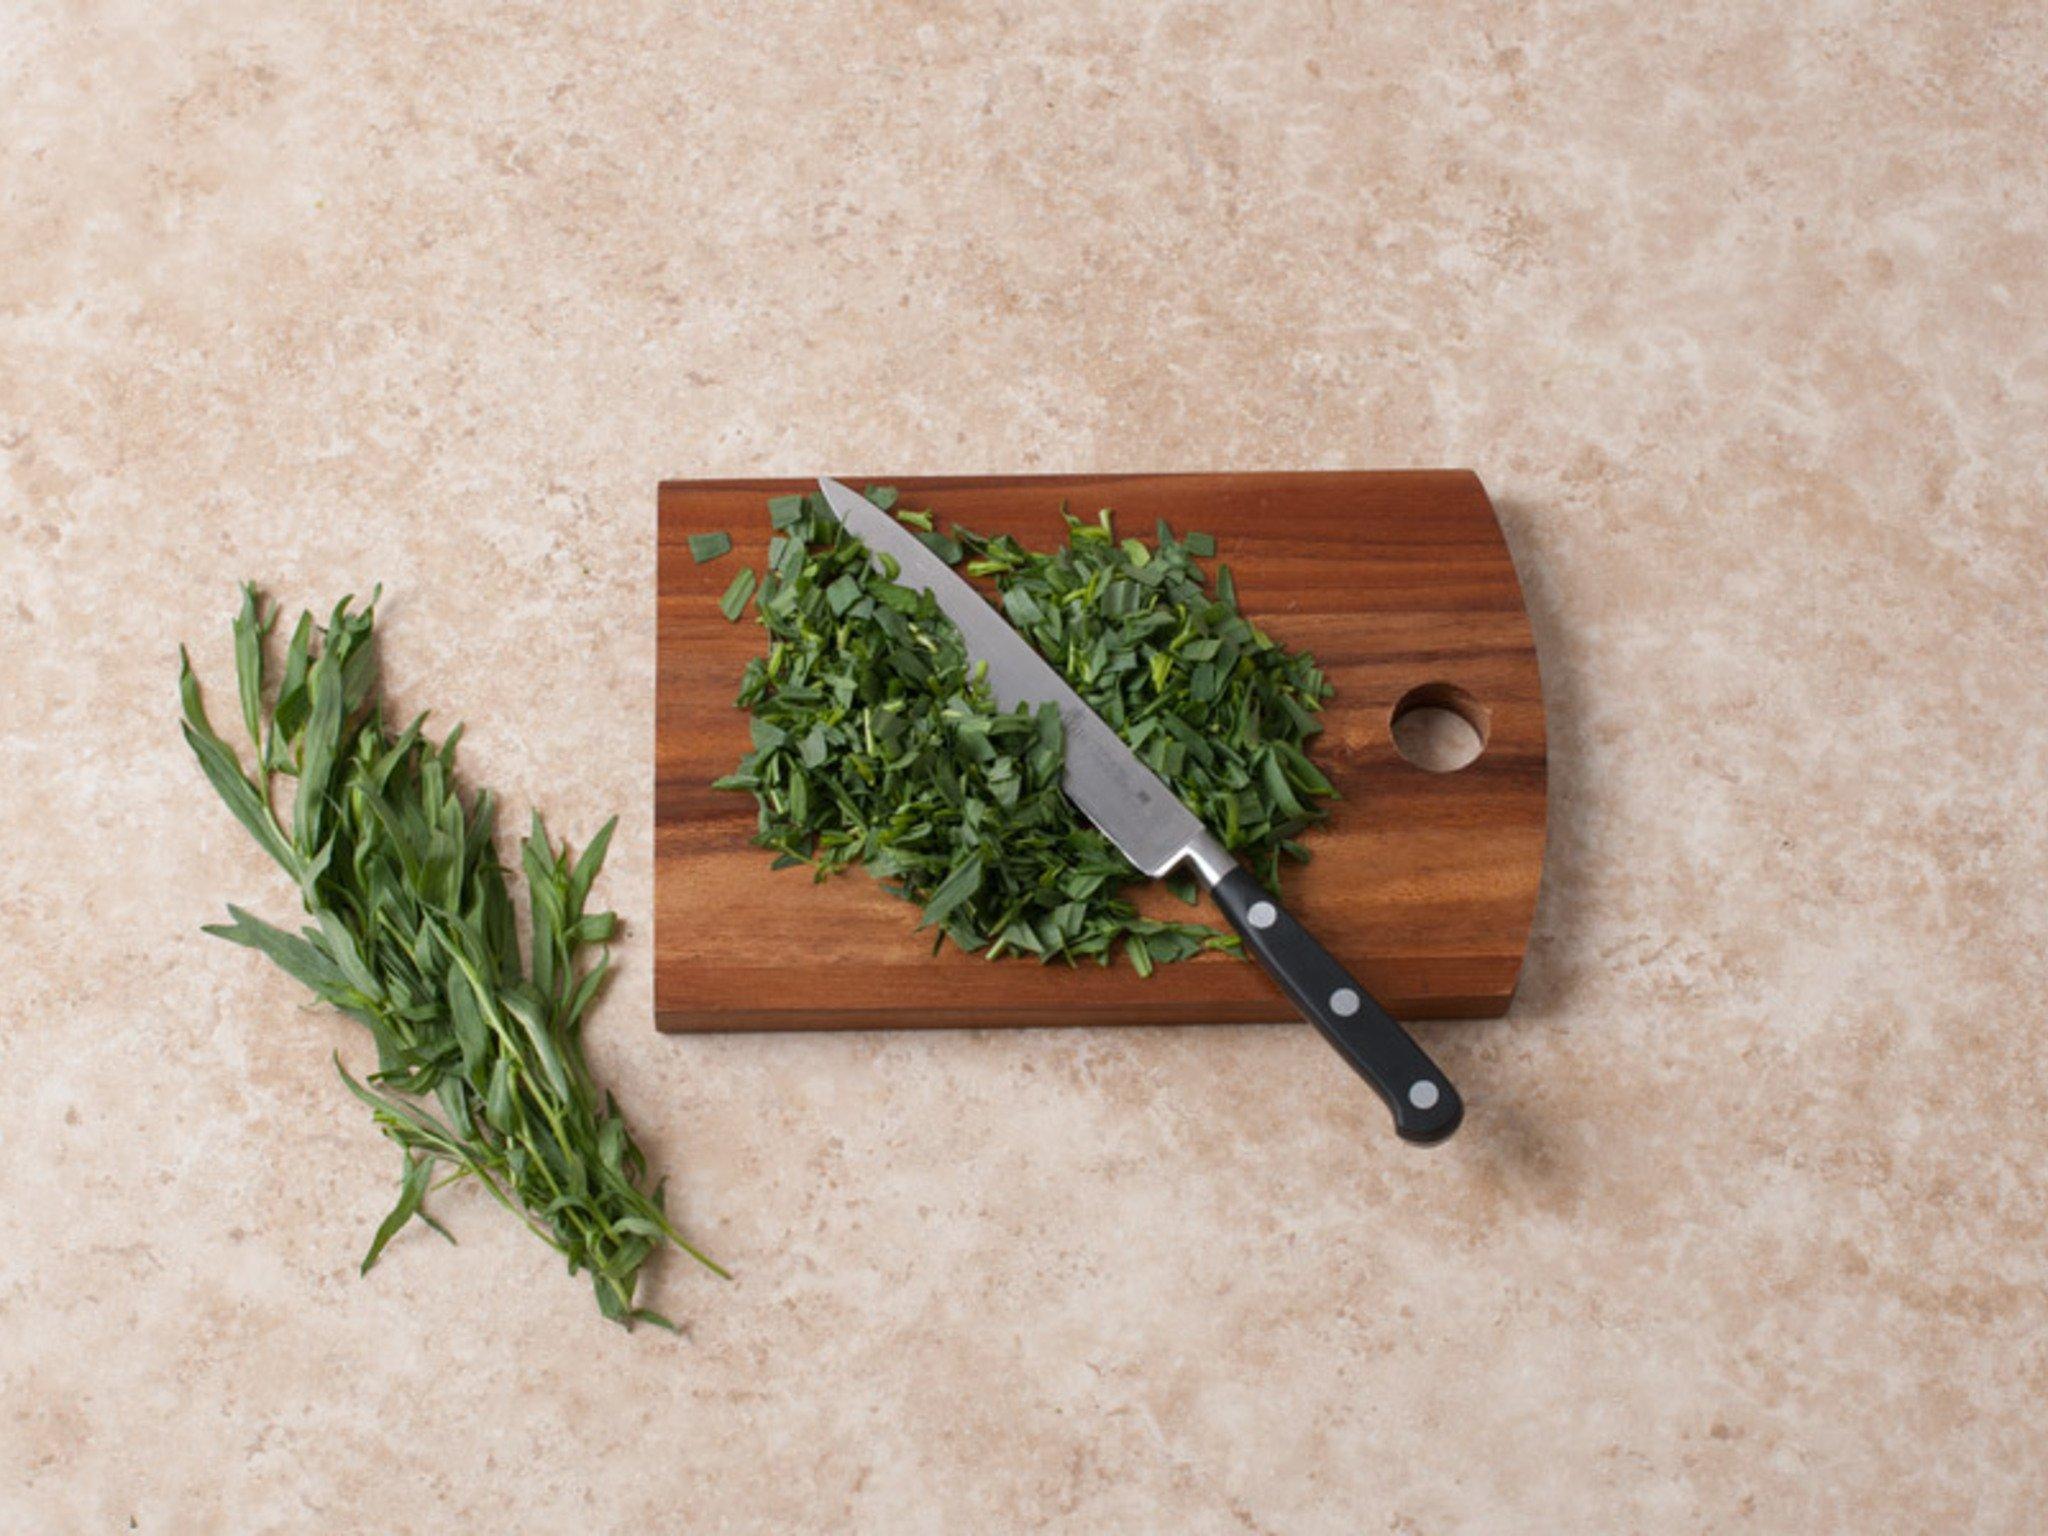 Как приготовить тархун в домашних условиях